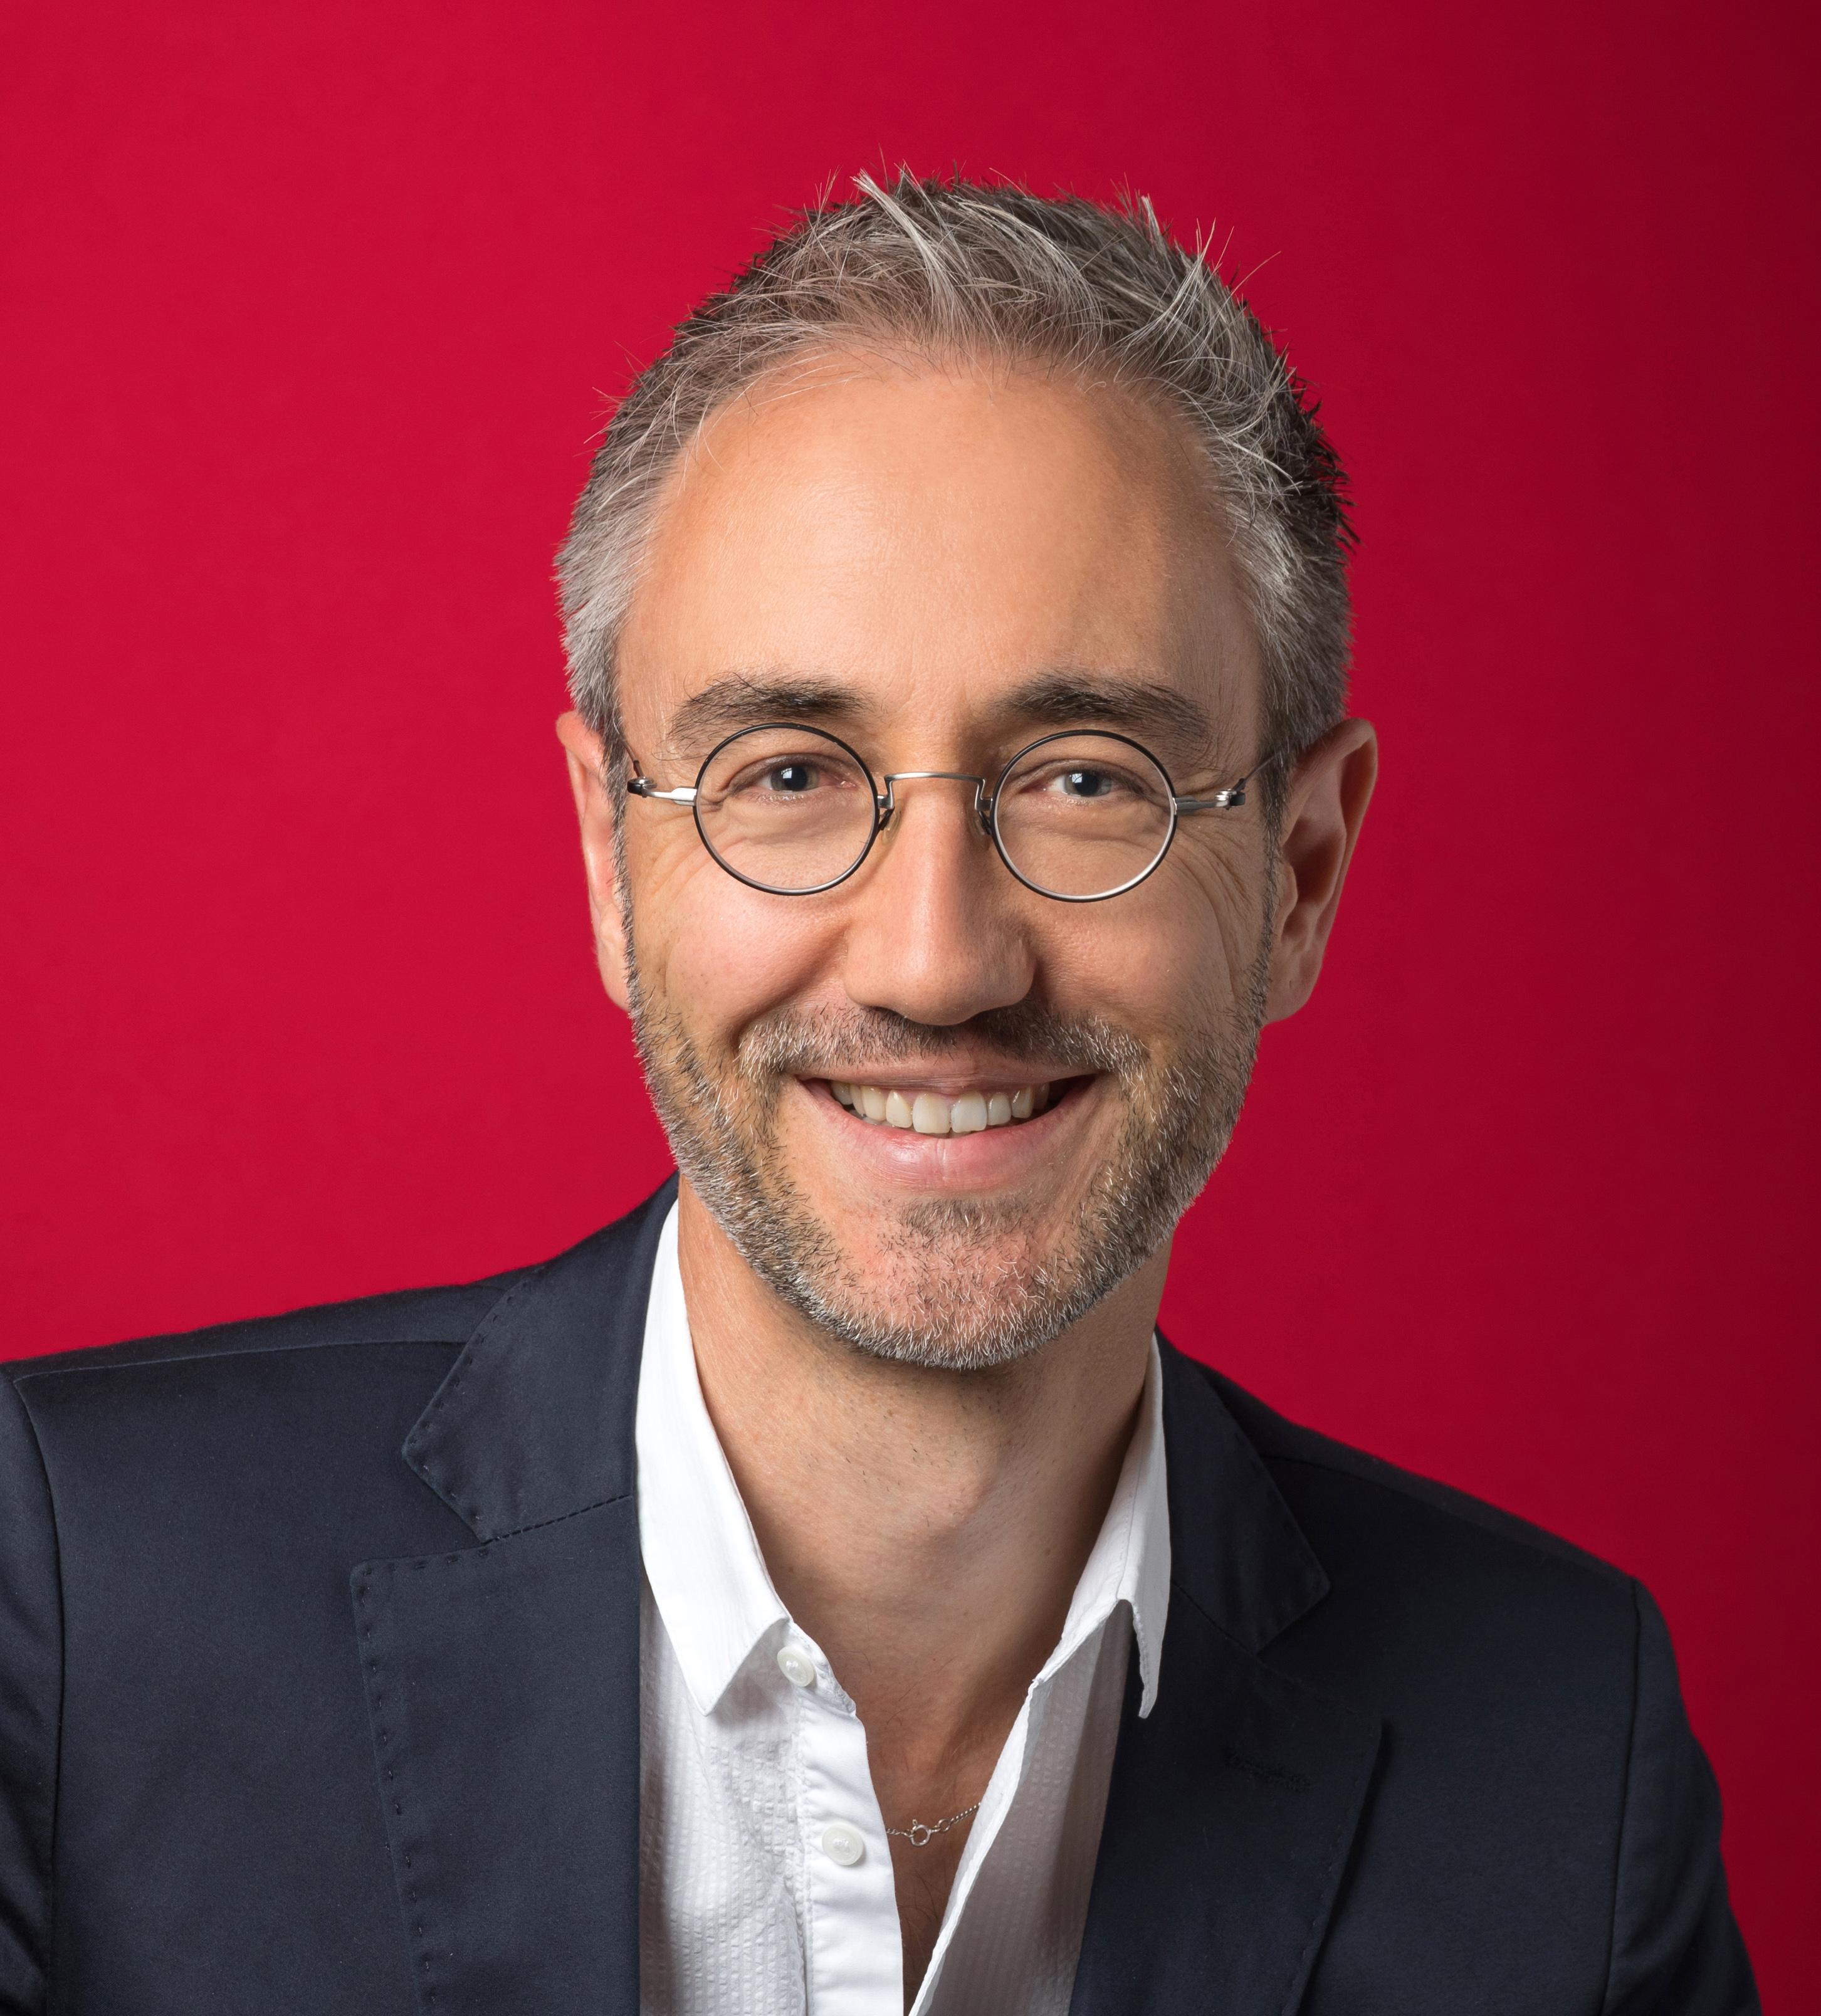 Laurent Turpault